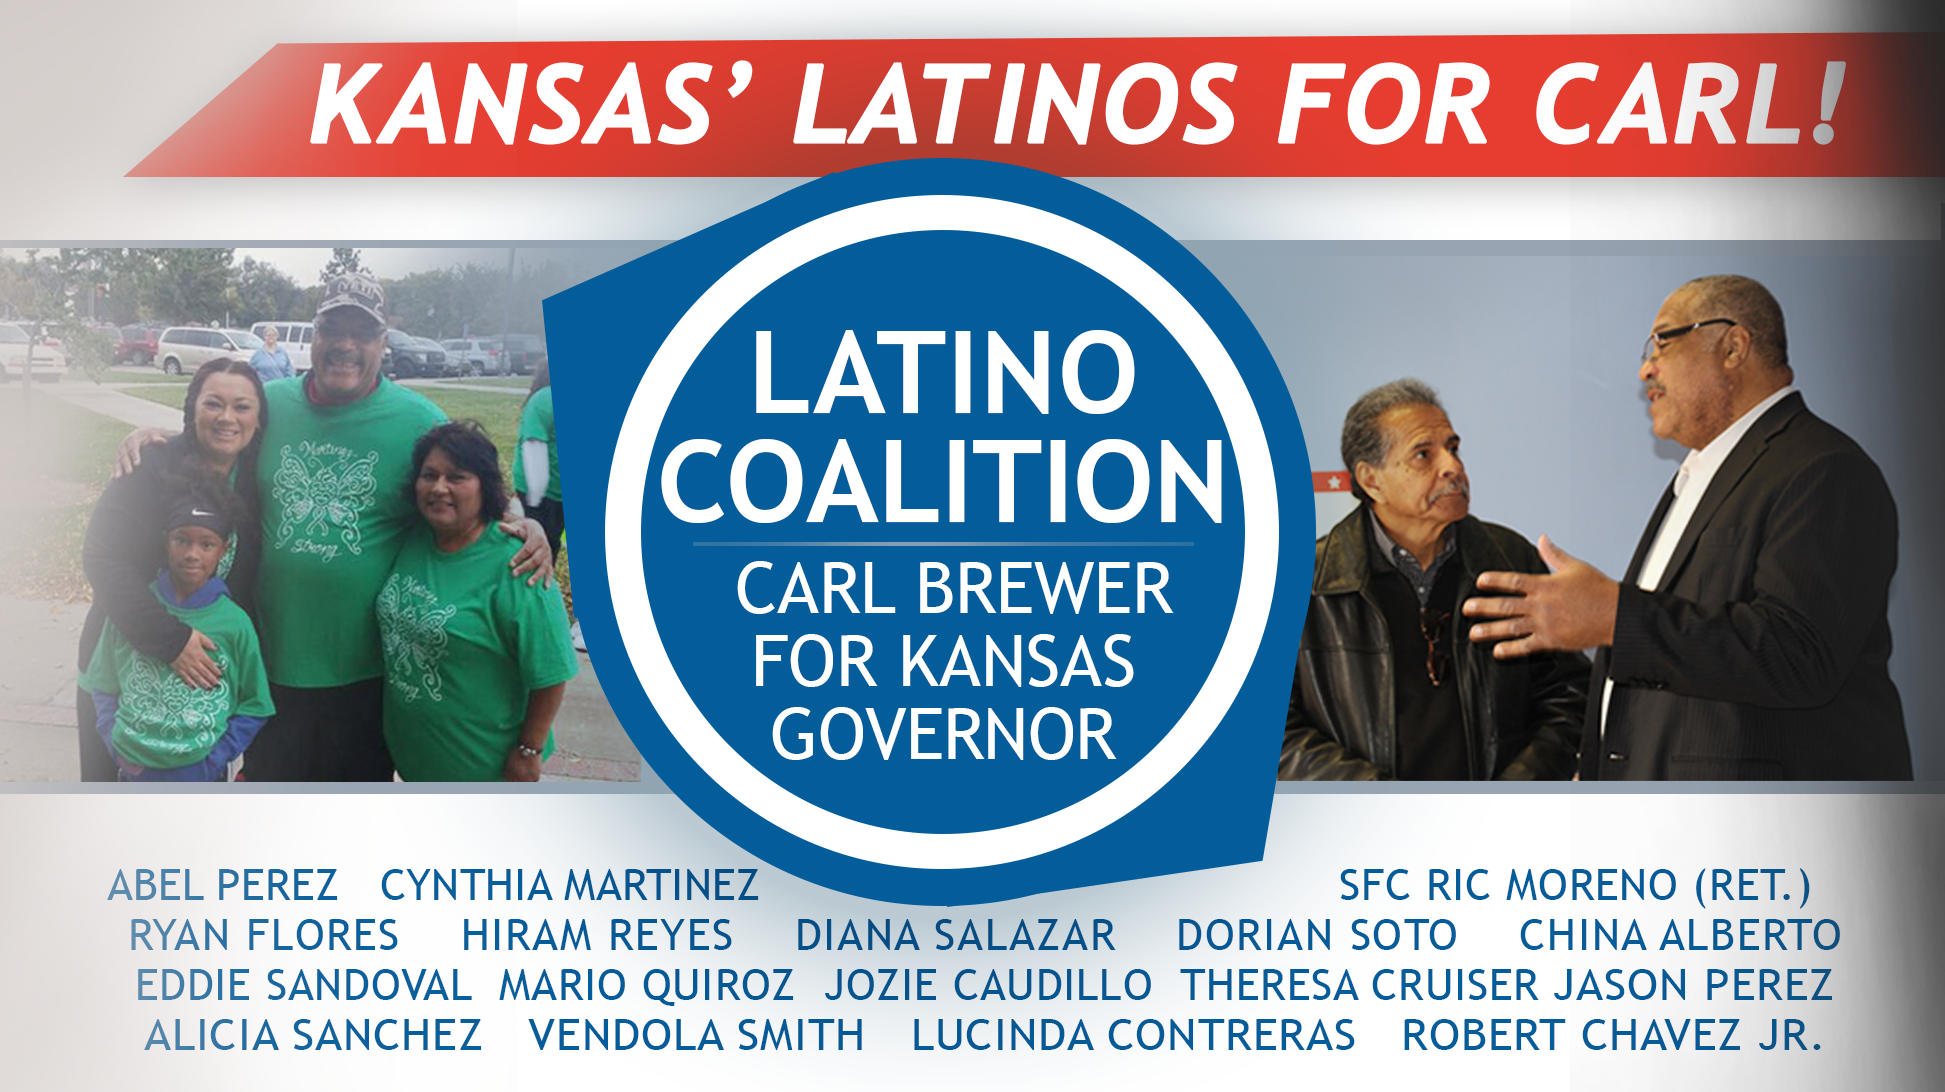 Latino Coalition - Carl Brewer for Kansas Governor